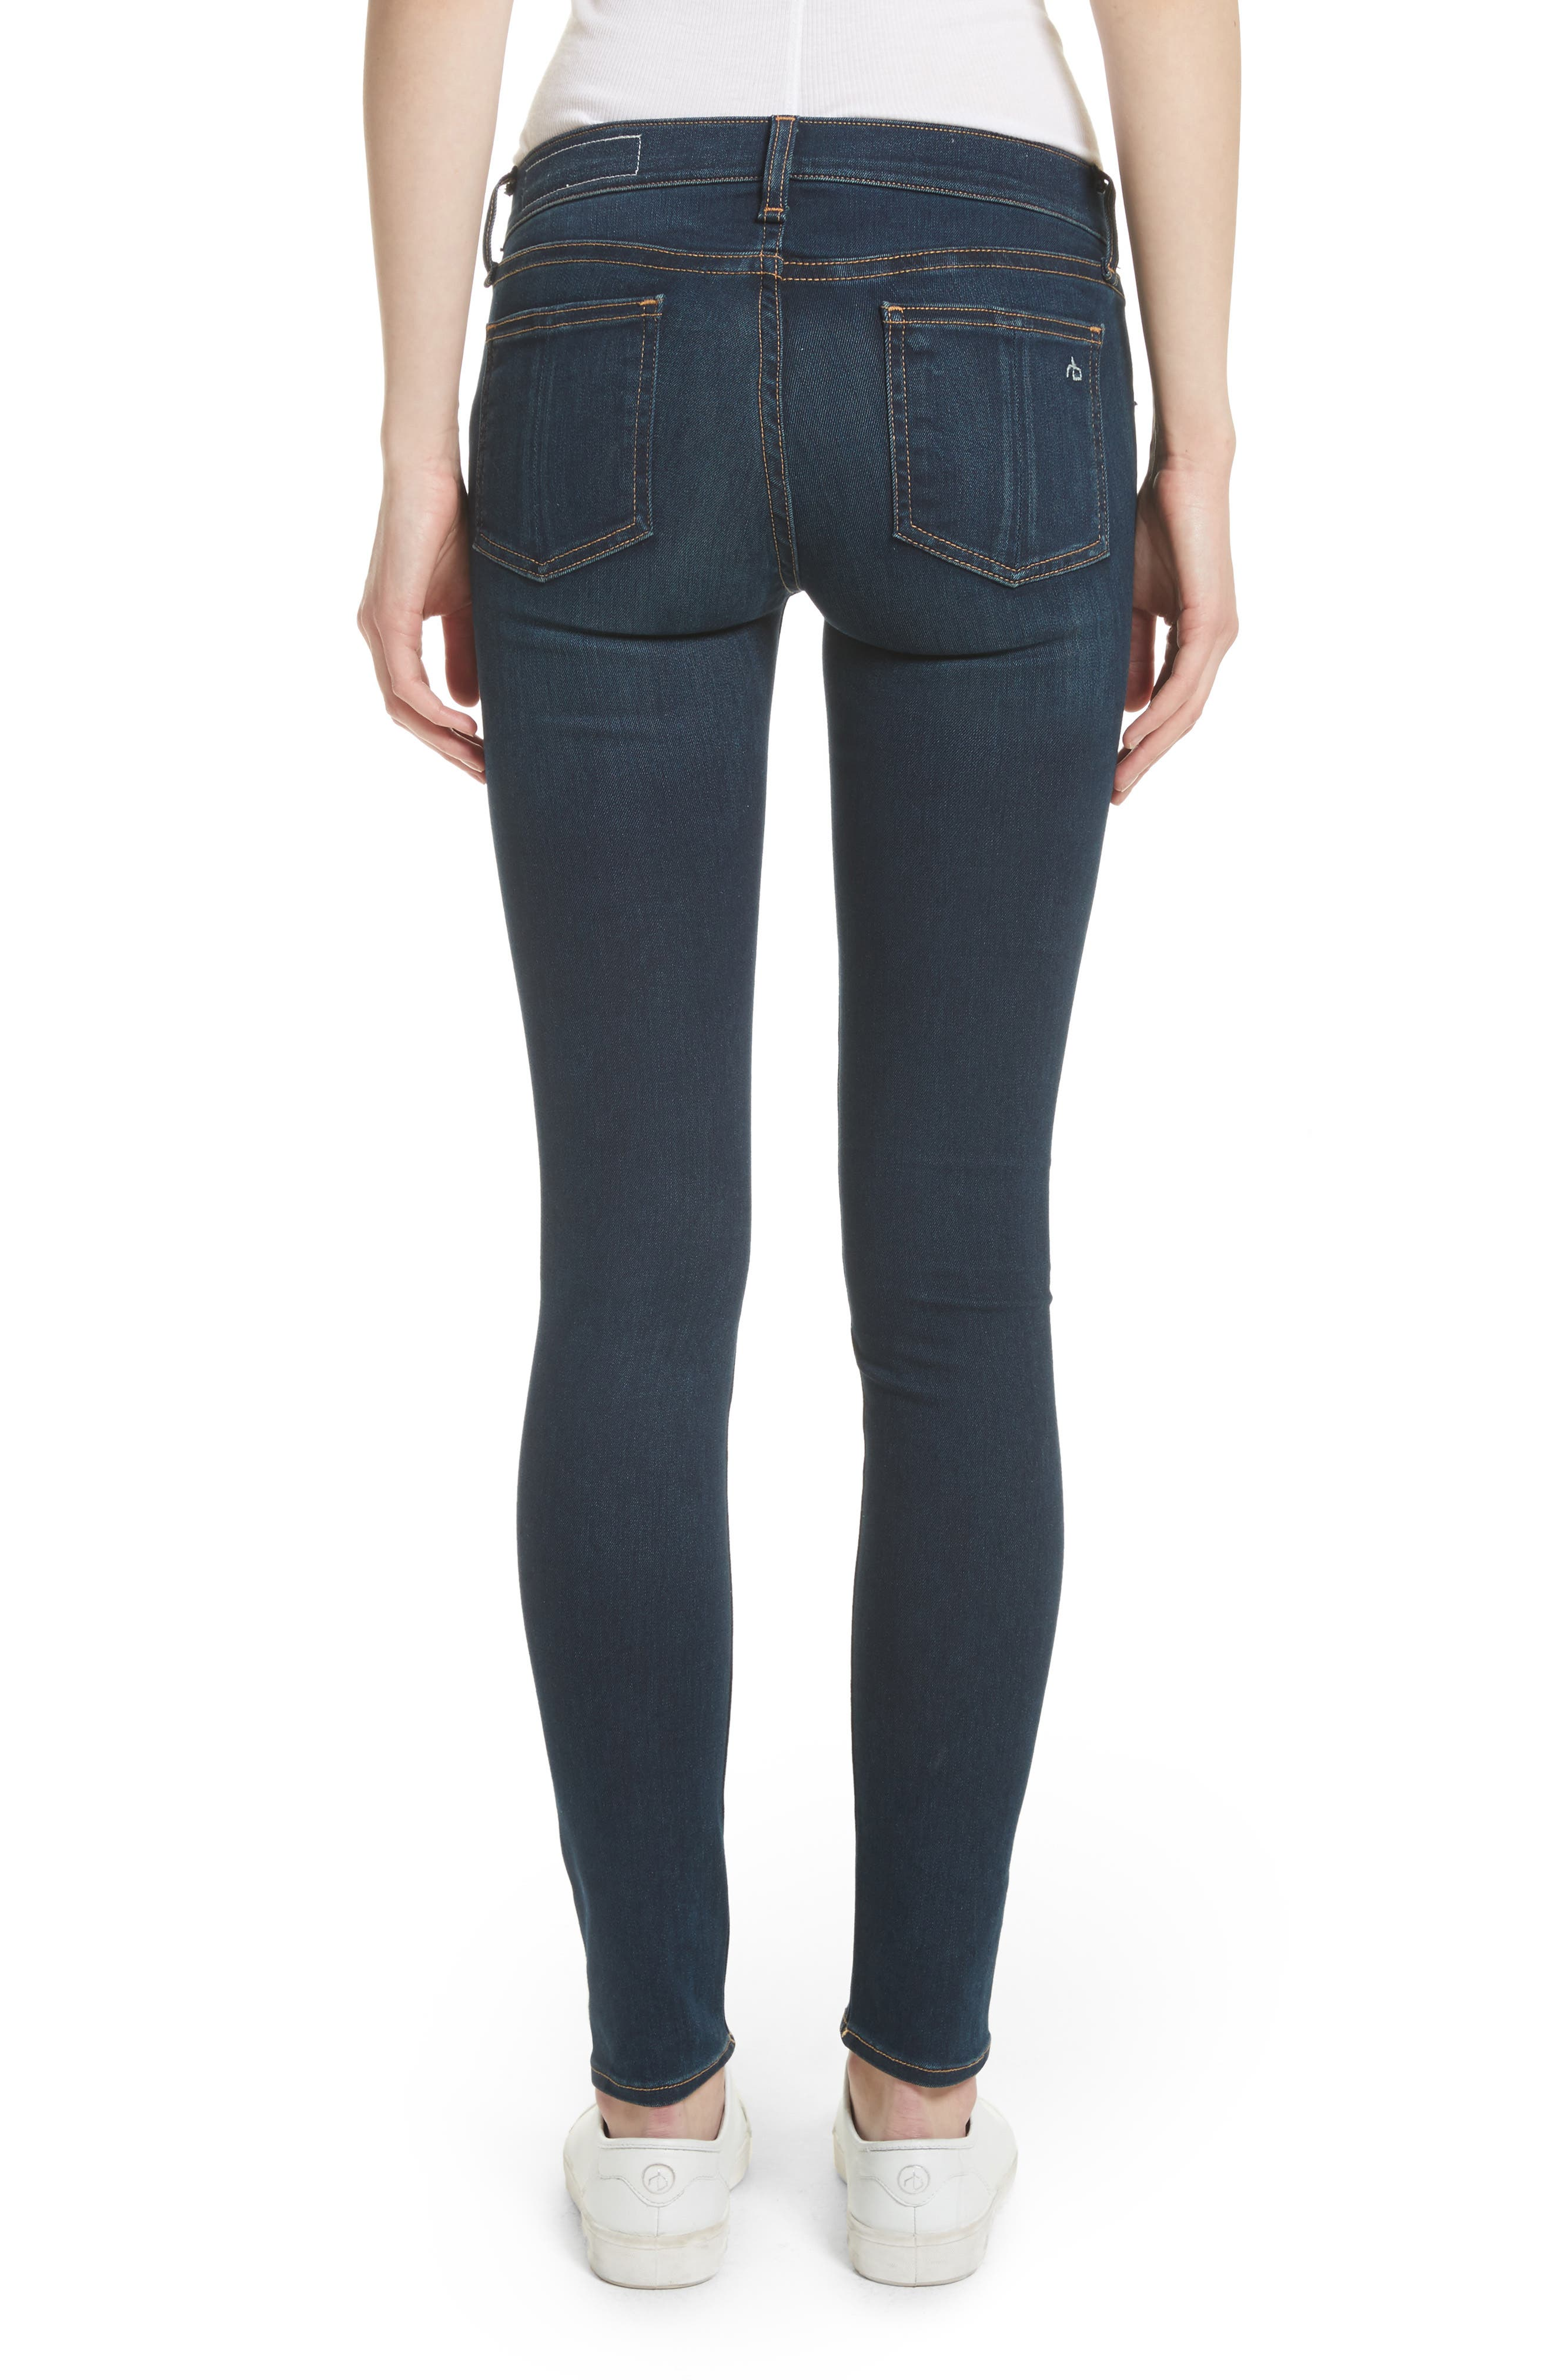 RAG & BONE, Skinny Stretch Jeans, Alternate thumbnail 2, color, BEDFORD